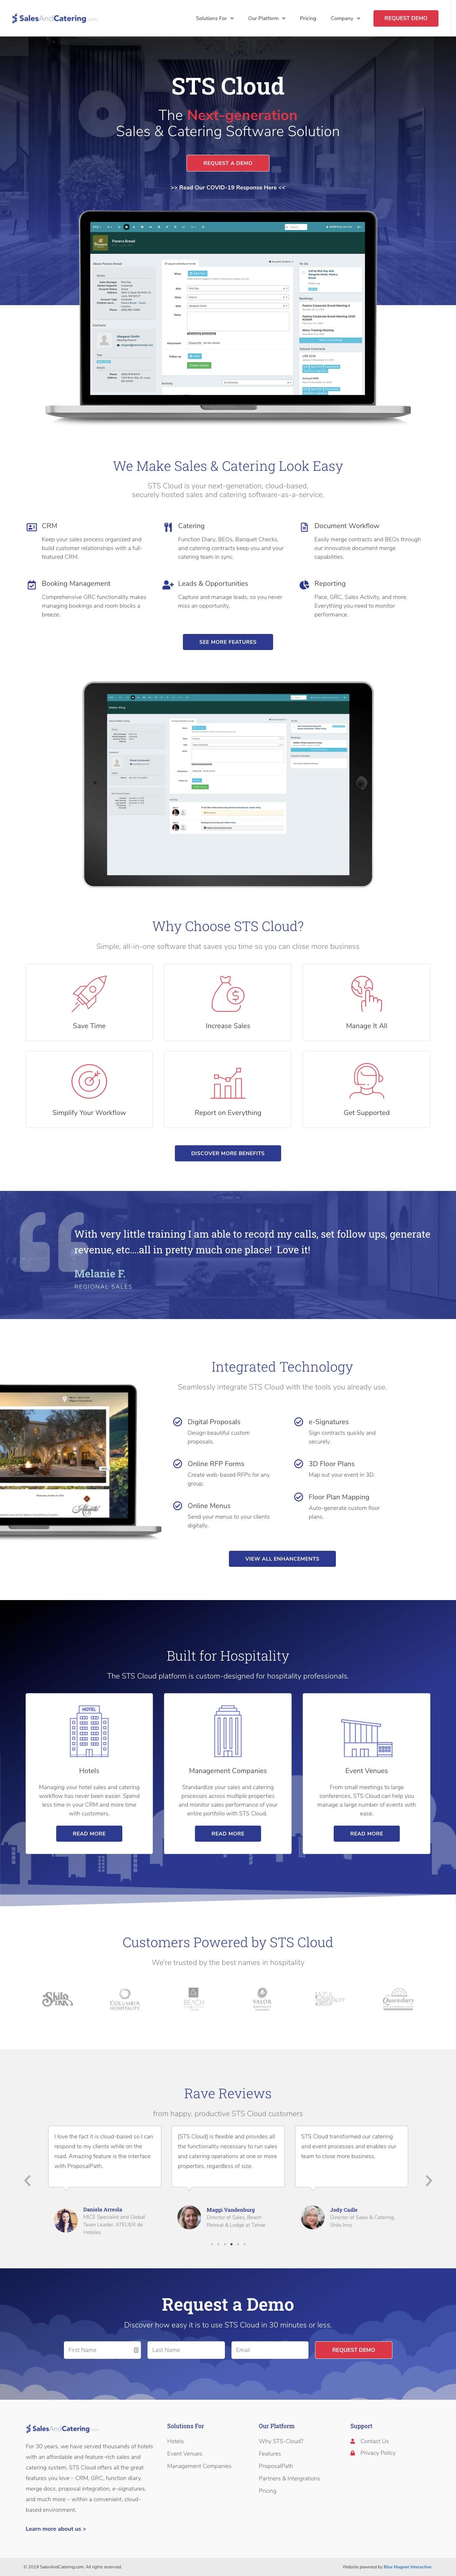 web design example salesandcatering